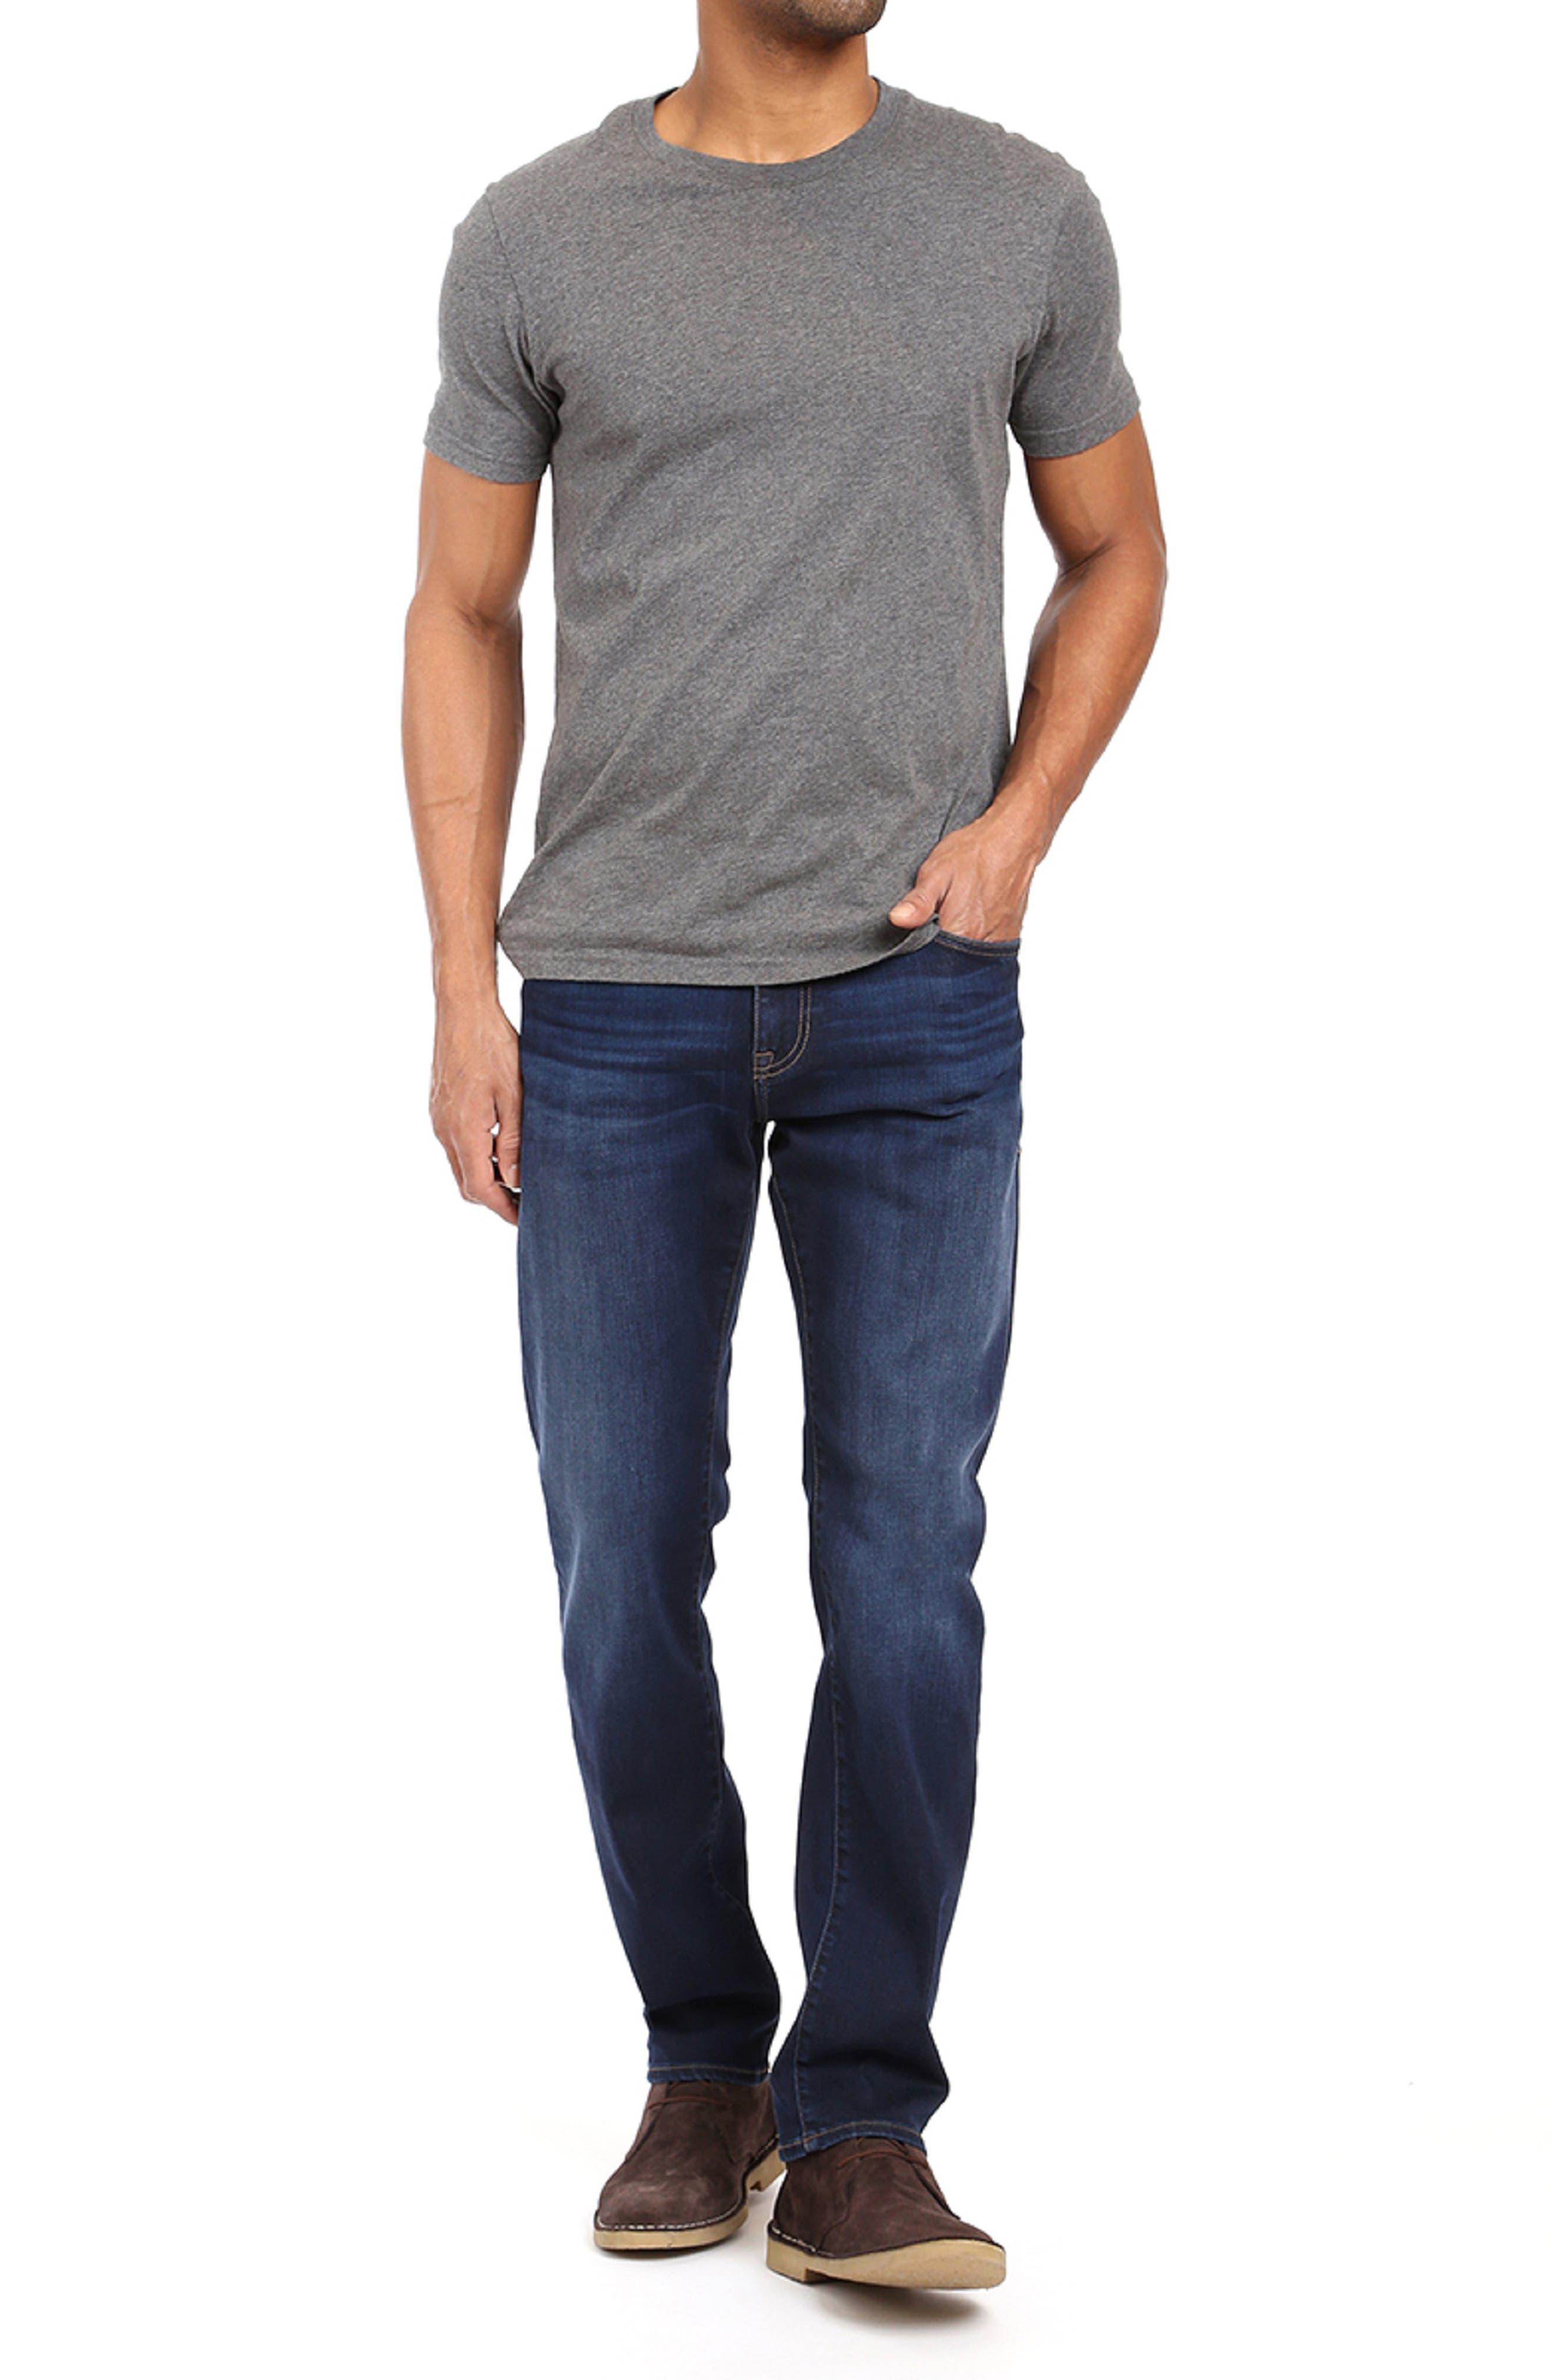 Zach Straight Leg Jeans,                             Alternate thumbnail 7, color,                             DEEP SOFT MOVE